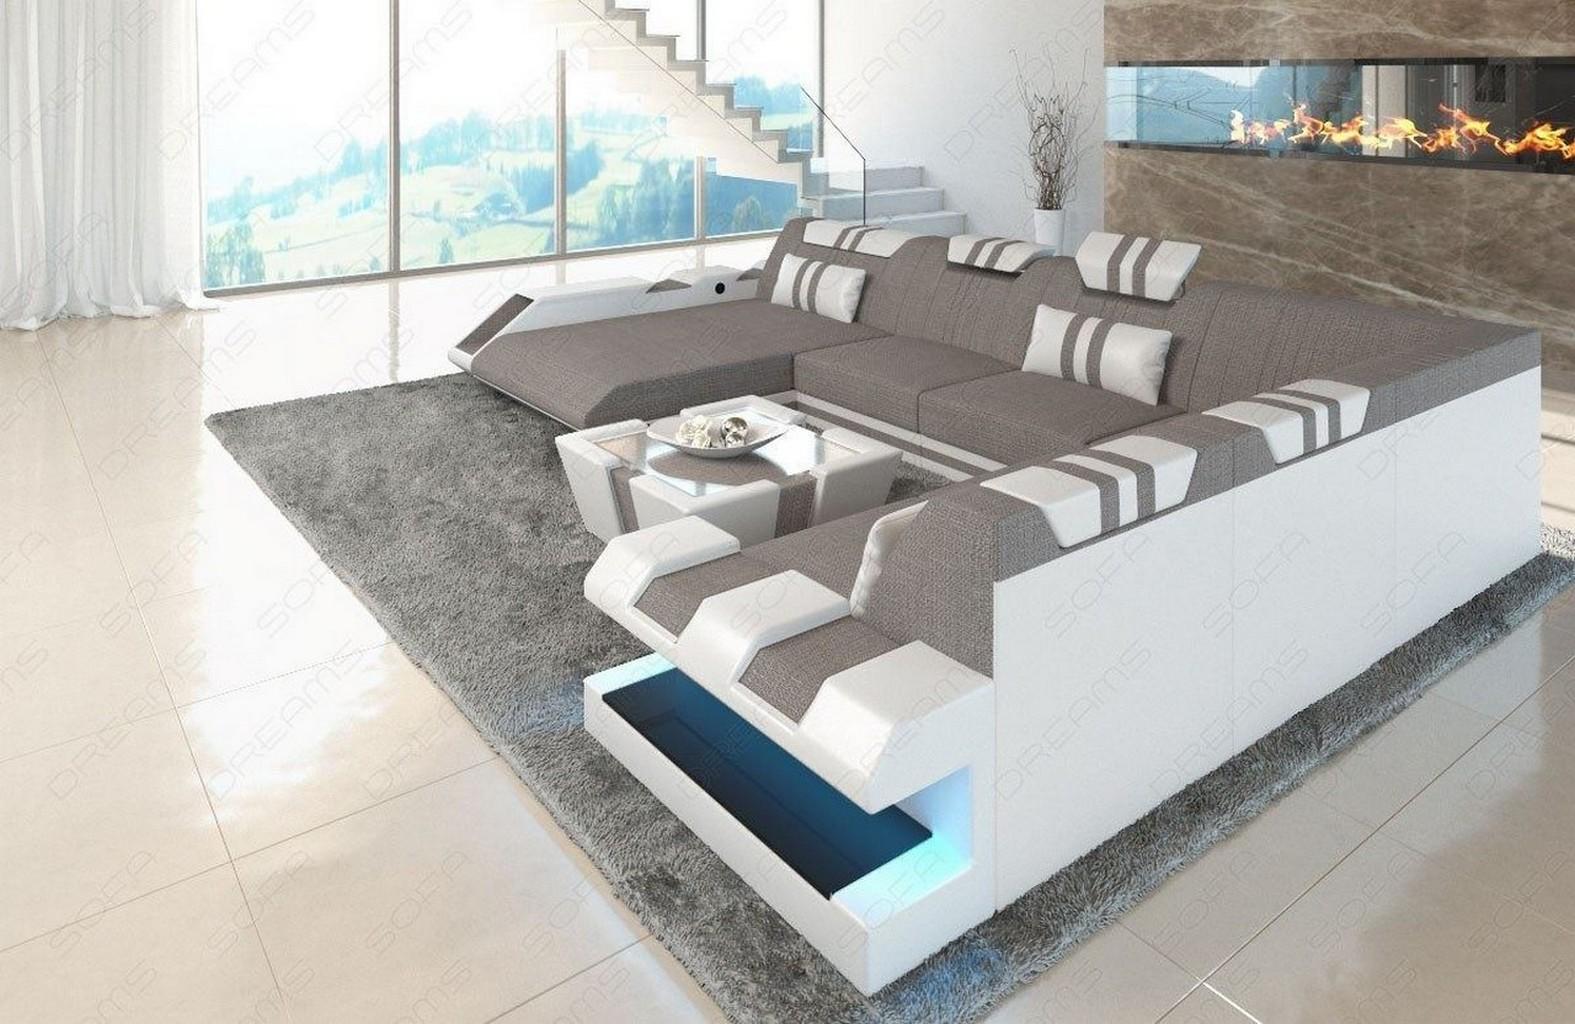 Sectional Sofa Fabric Apollonia Xl Designsofa Colour Select With Led Lighting Ebay